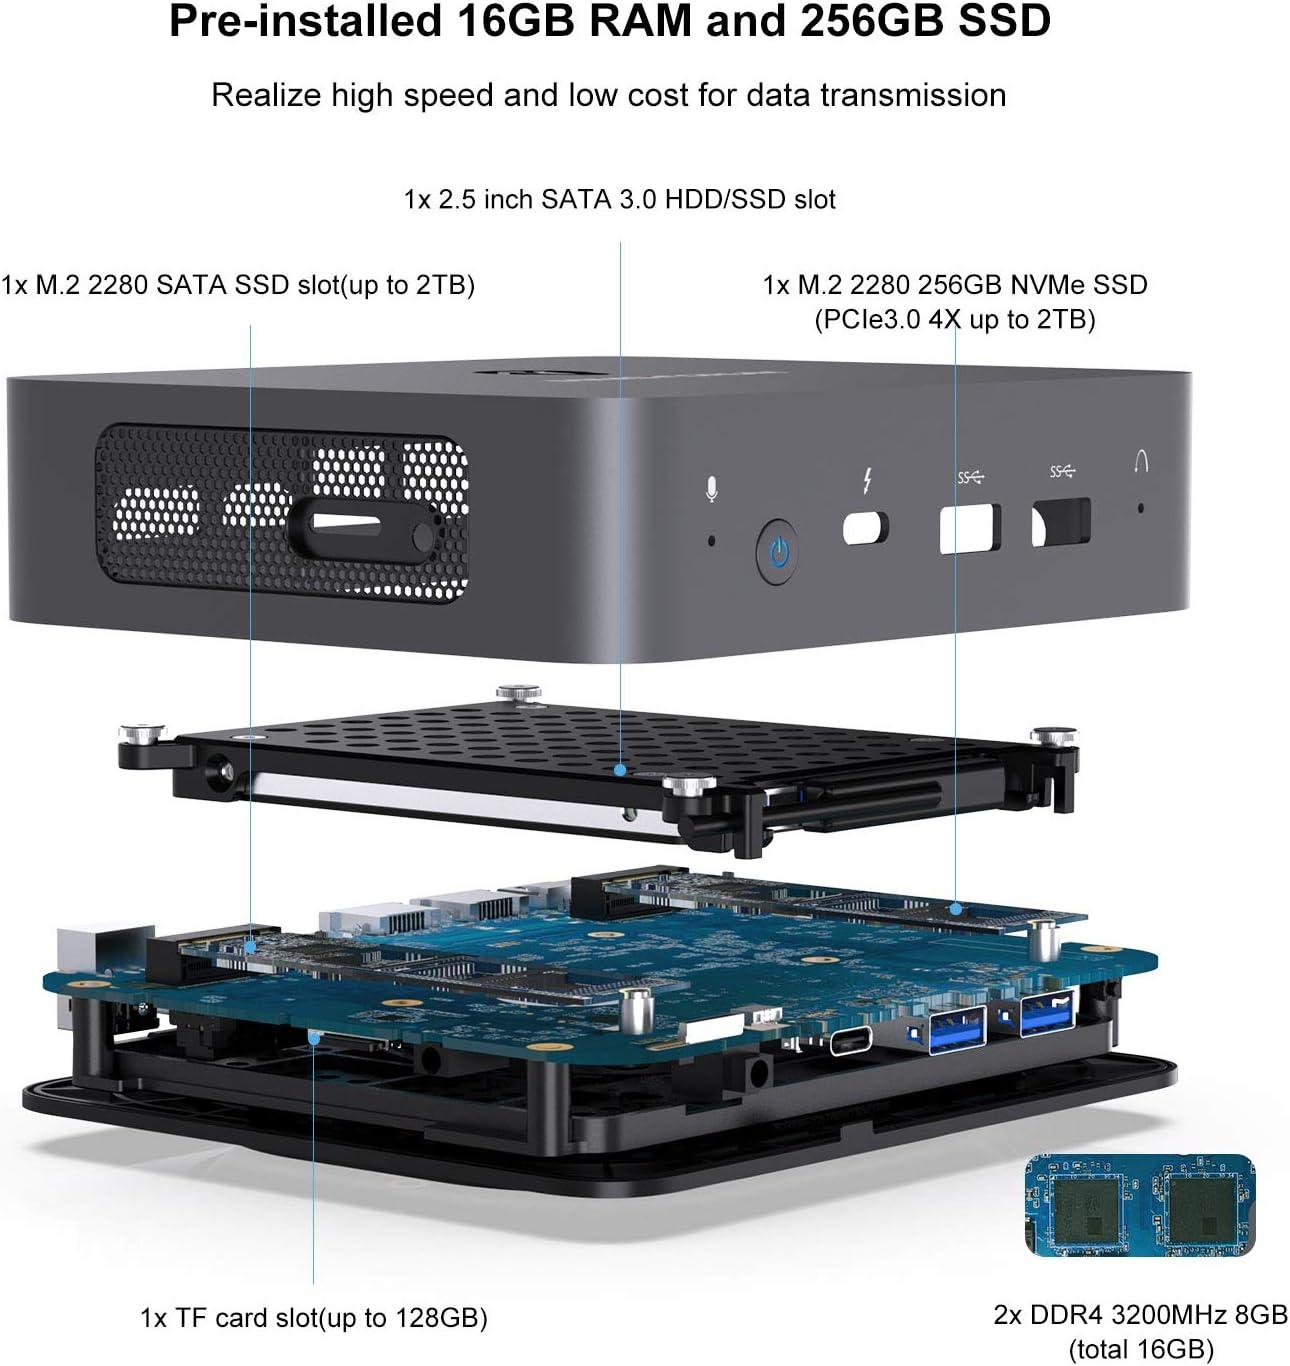 BT5.1 2xRJ45 Thunderbolt 3 HDMI 2.0//USB-C DIY SSD 16GB DDR4 RAM Outputs X35G Mini PC 10th Gen Intel Core i3-1005G1 Windows 10 Pro //DP 5K@60Hz 4xUSB Port 256GB NVMe SSD